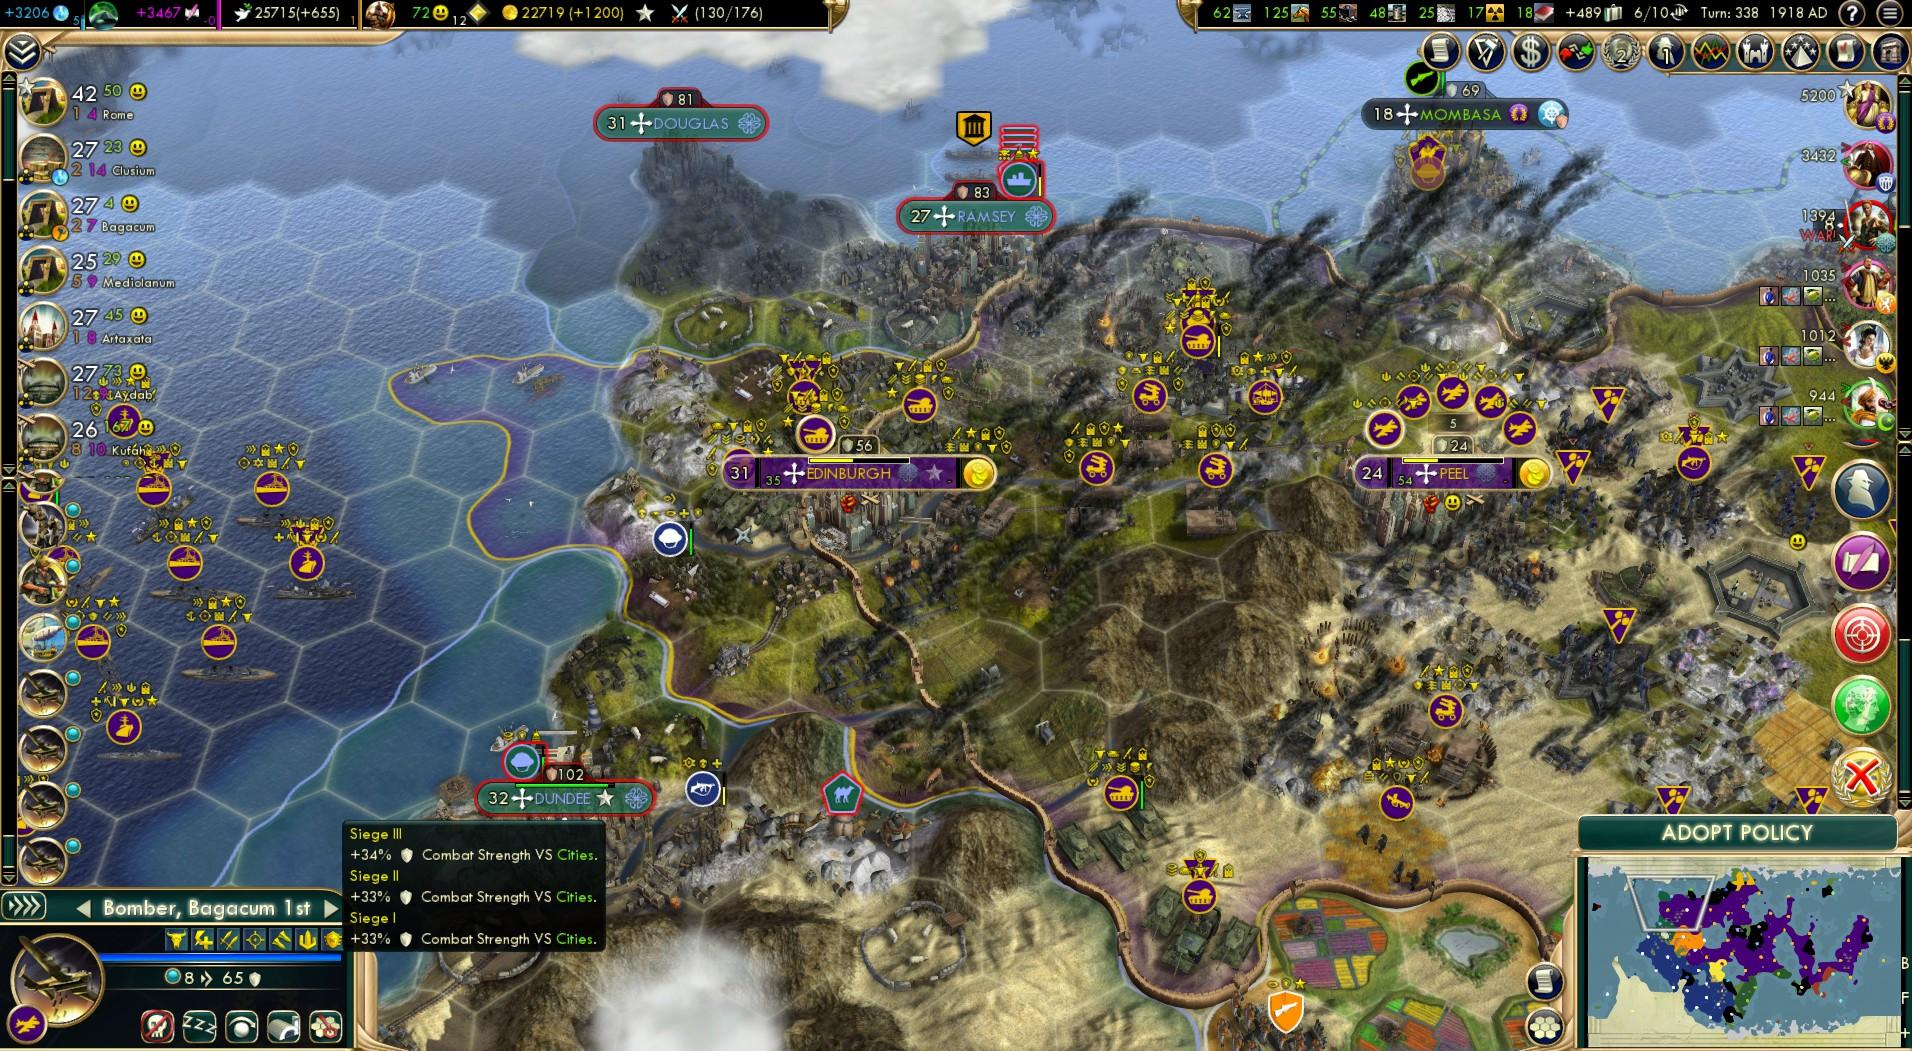 Sid Meier's Civilization V Screenshot 2018.03.19 - 18.22.56.69.jpg